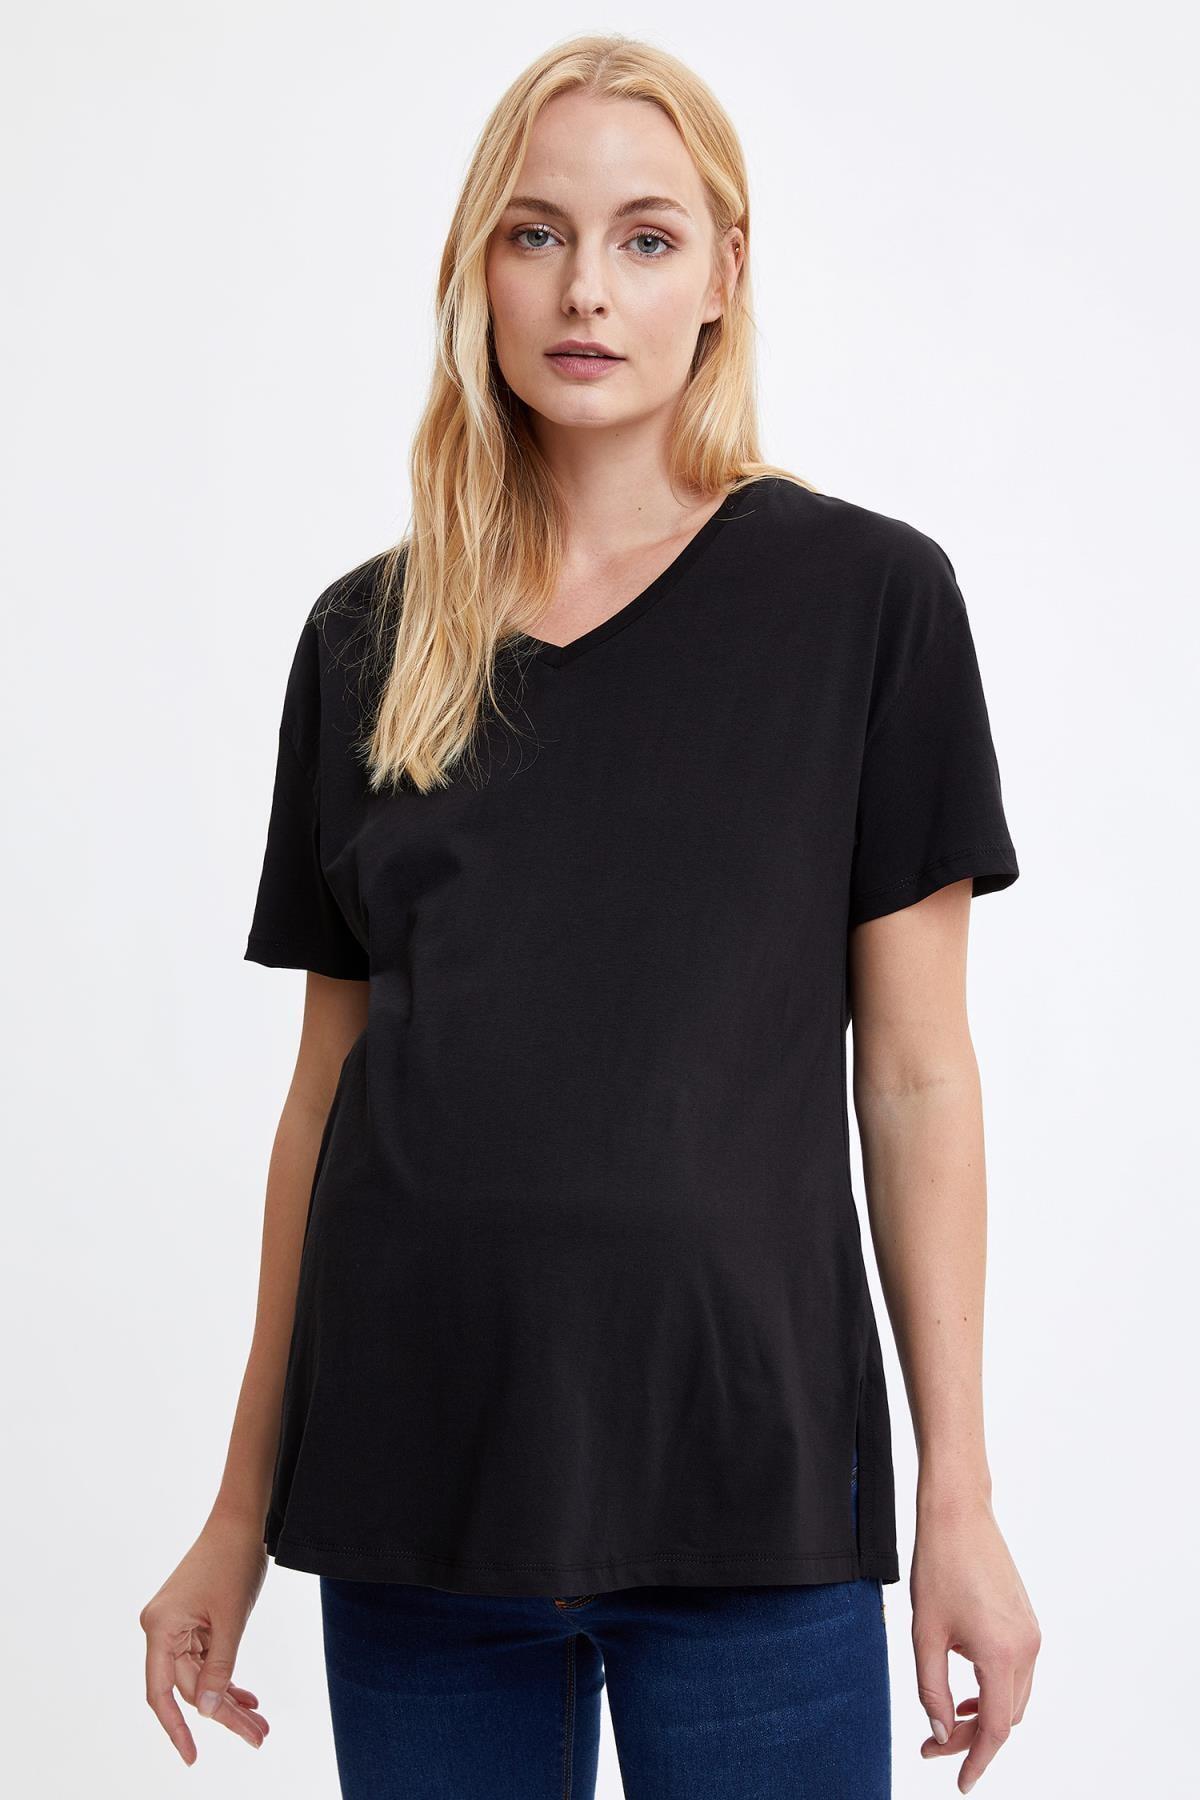 DeFacto Kadın Black Red Relax Fit Kısa Kollu Hamile T-Shirt N1670AZ20AU